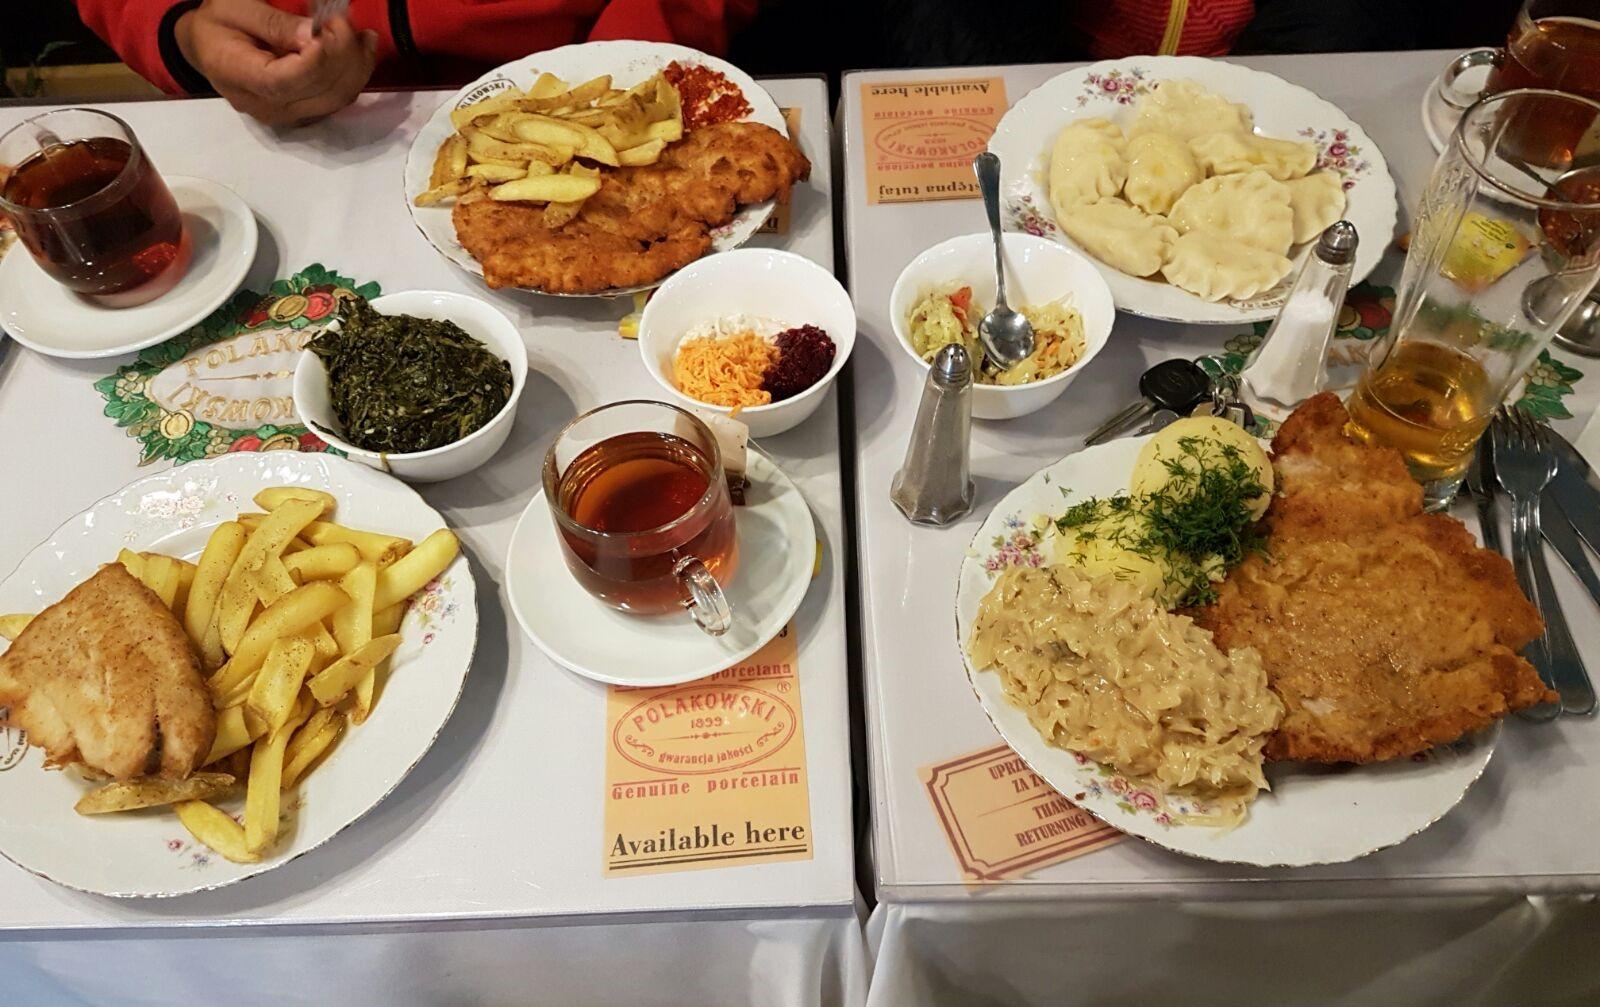 Menu makanan khas Polandia, fillet ikan goreng, kentang, sayur daun kare. Rasanya enak dan hampir diterima lidah melayu.